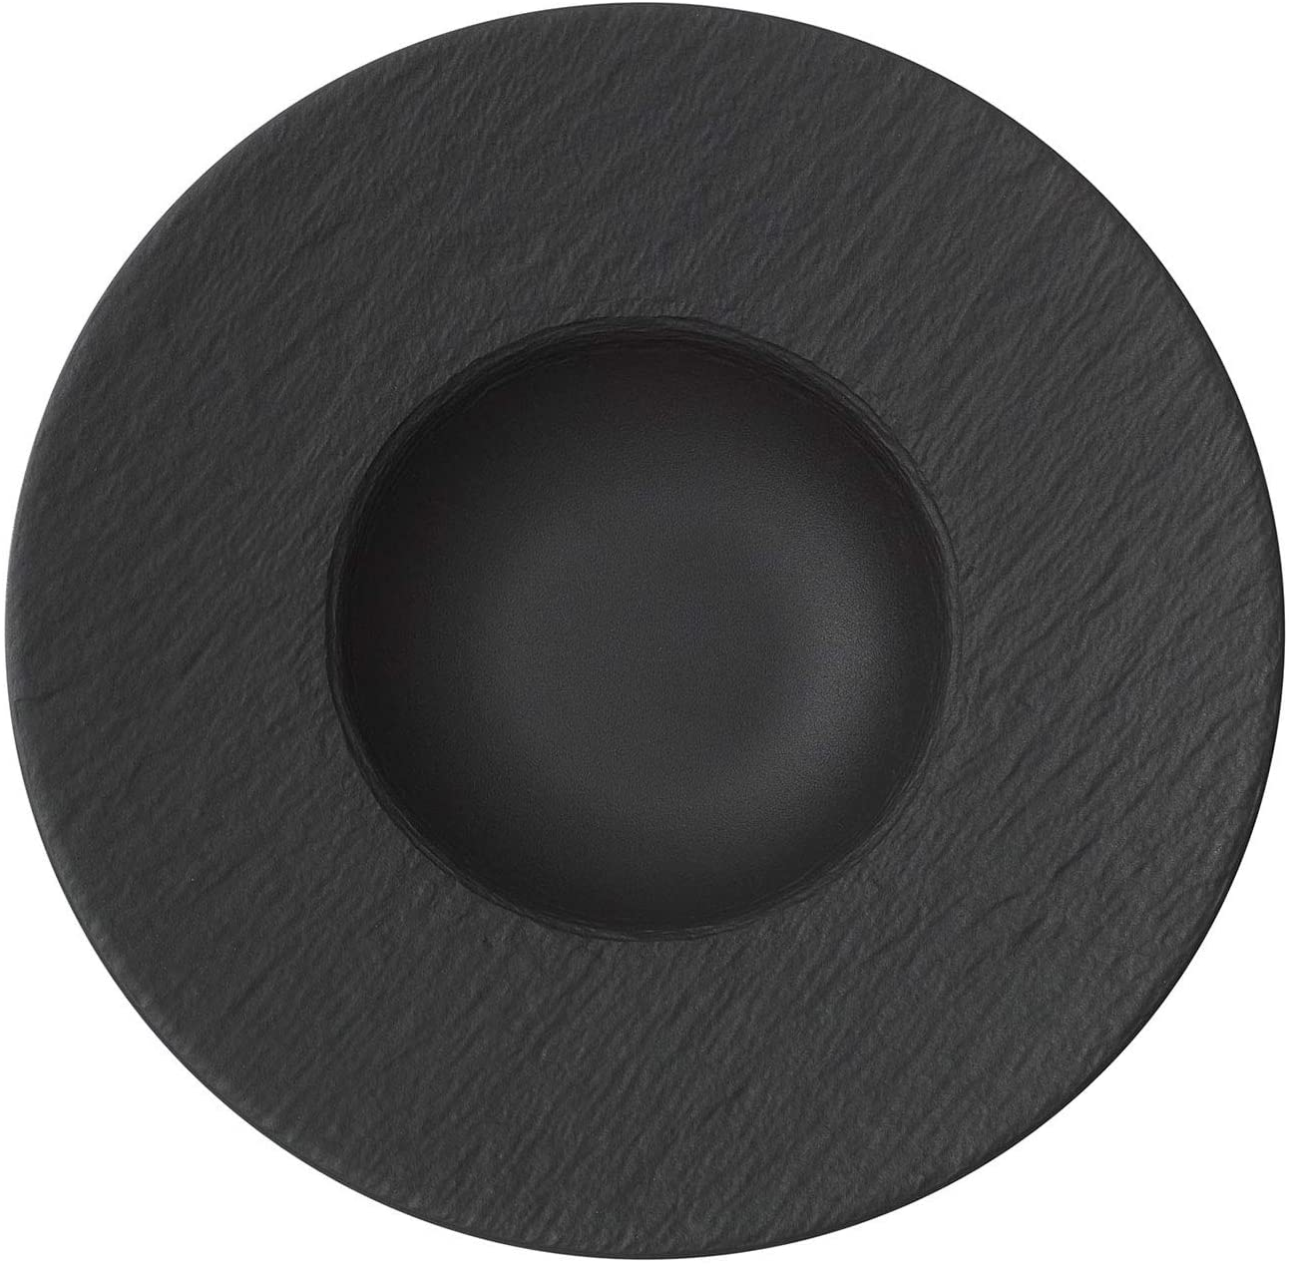 Villeroy & Boch Manufacture Rock Plato para pasta Porcelana Premium, Negro (Rock), 29 cm